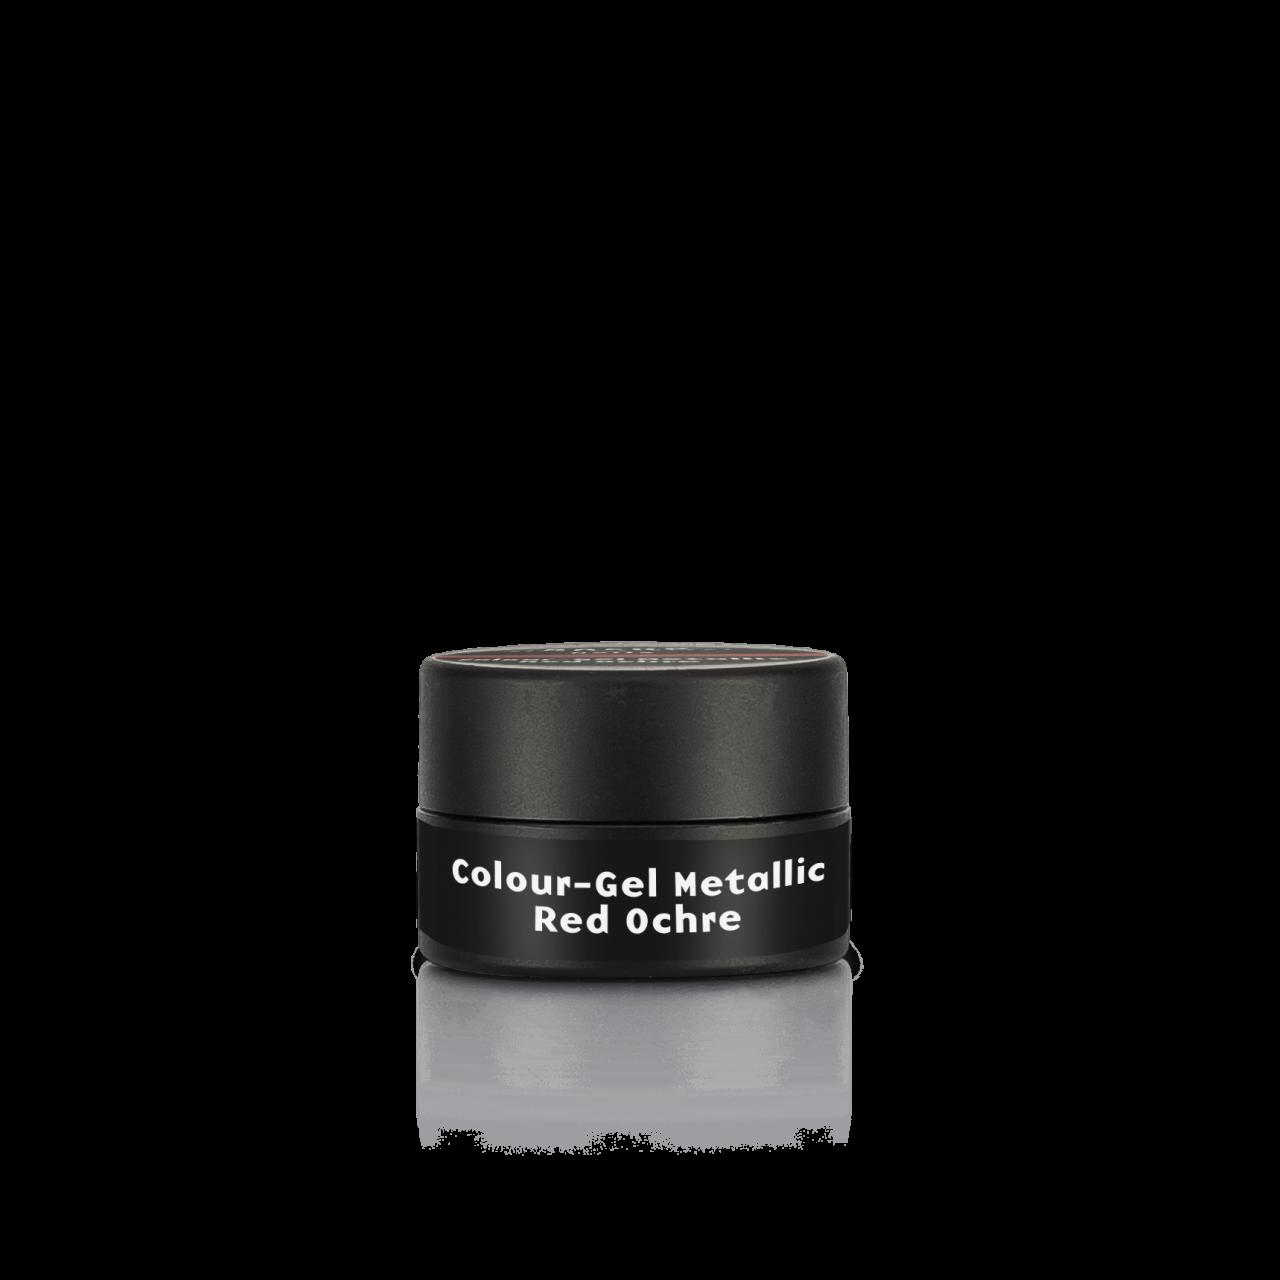 Colour-Gel Metallic Red Ochre 5 ml